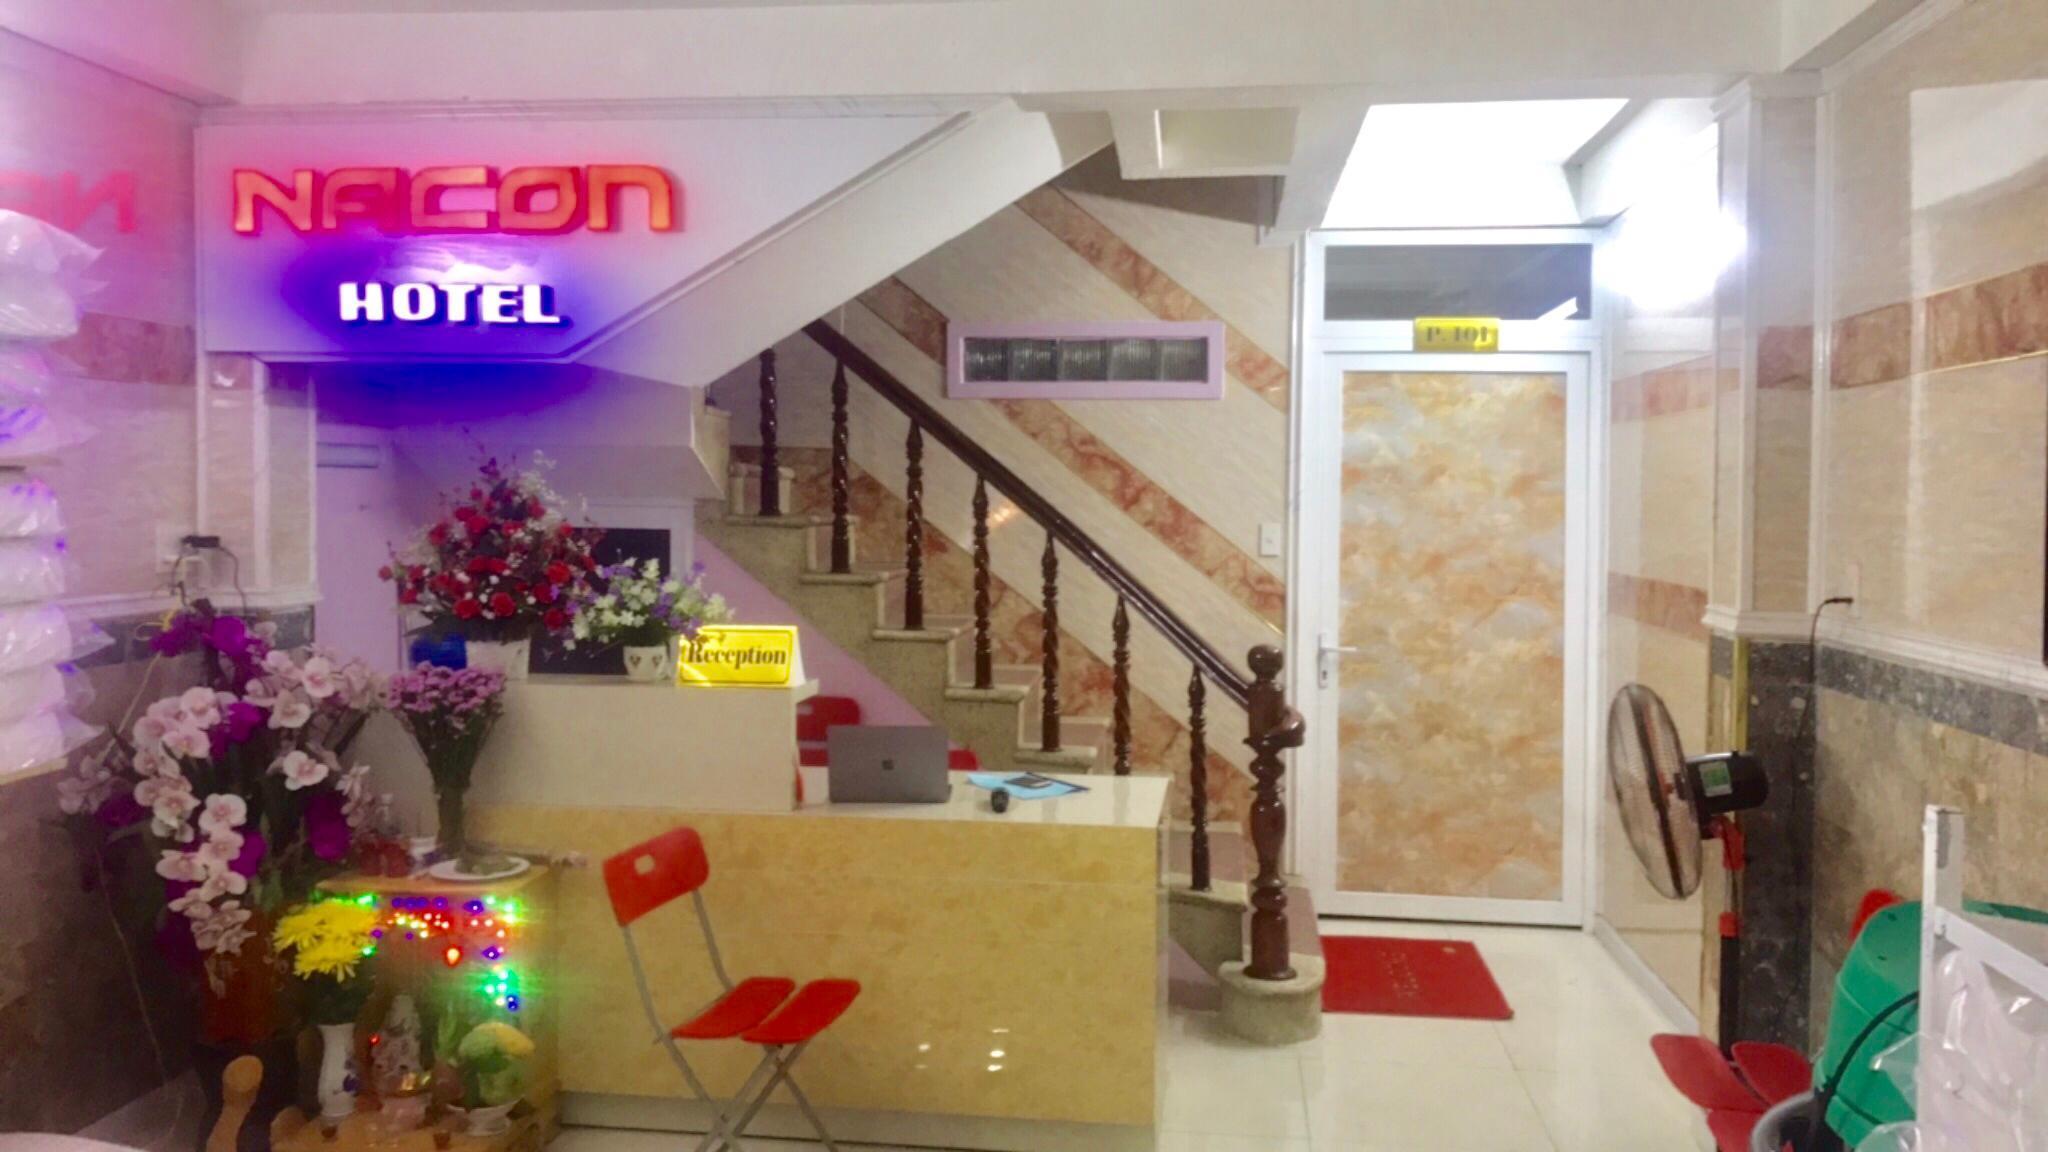 NACON HOTEL